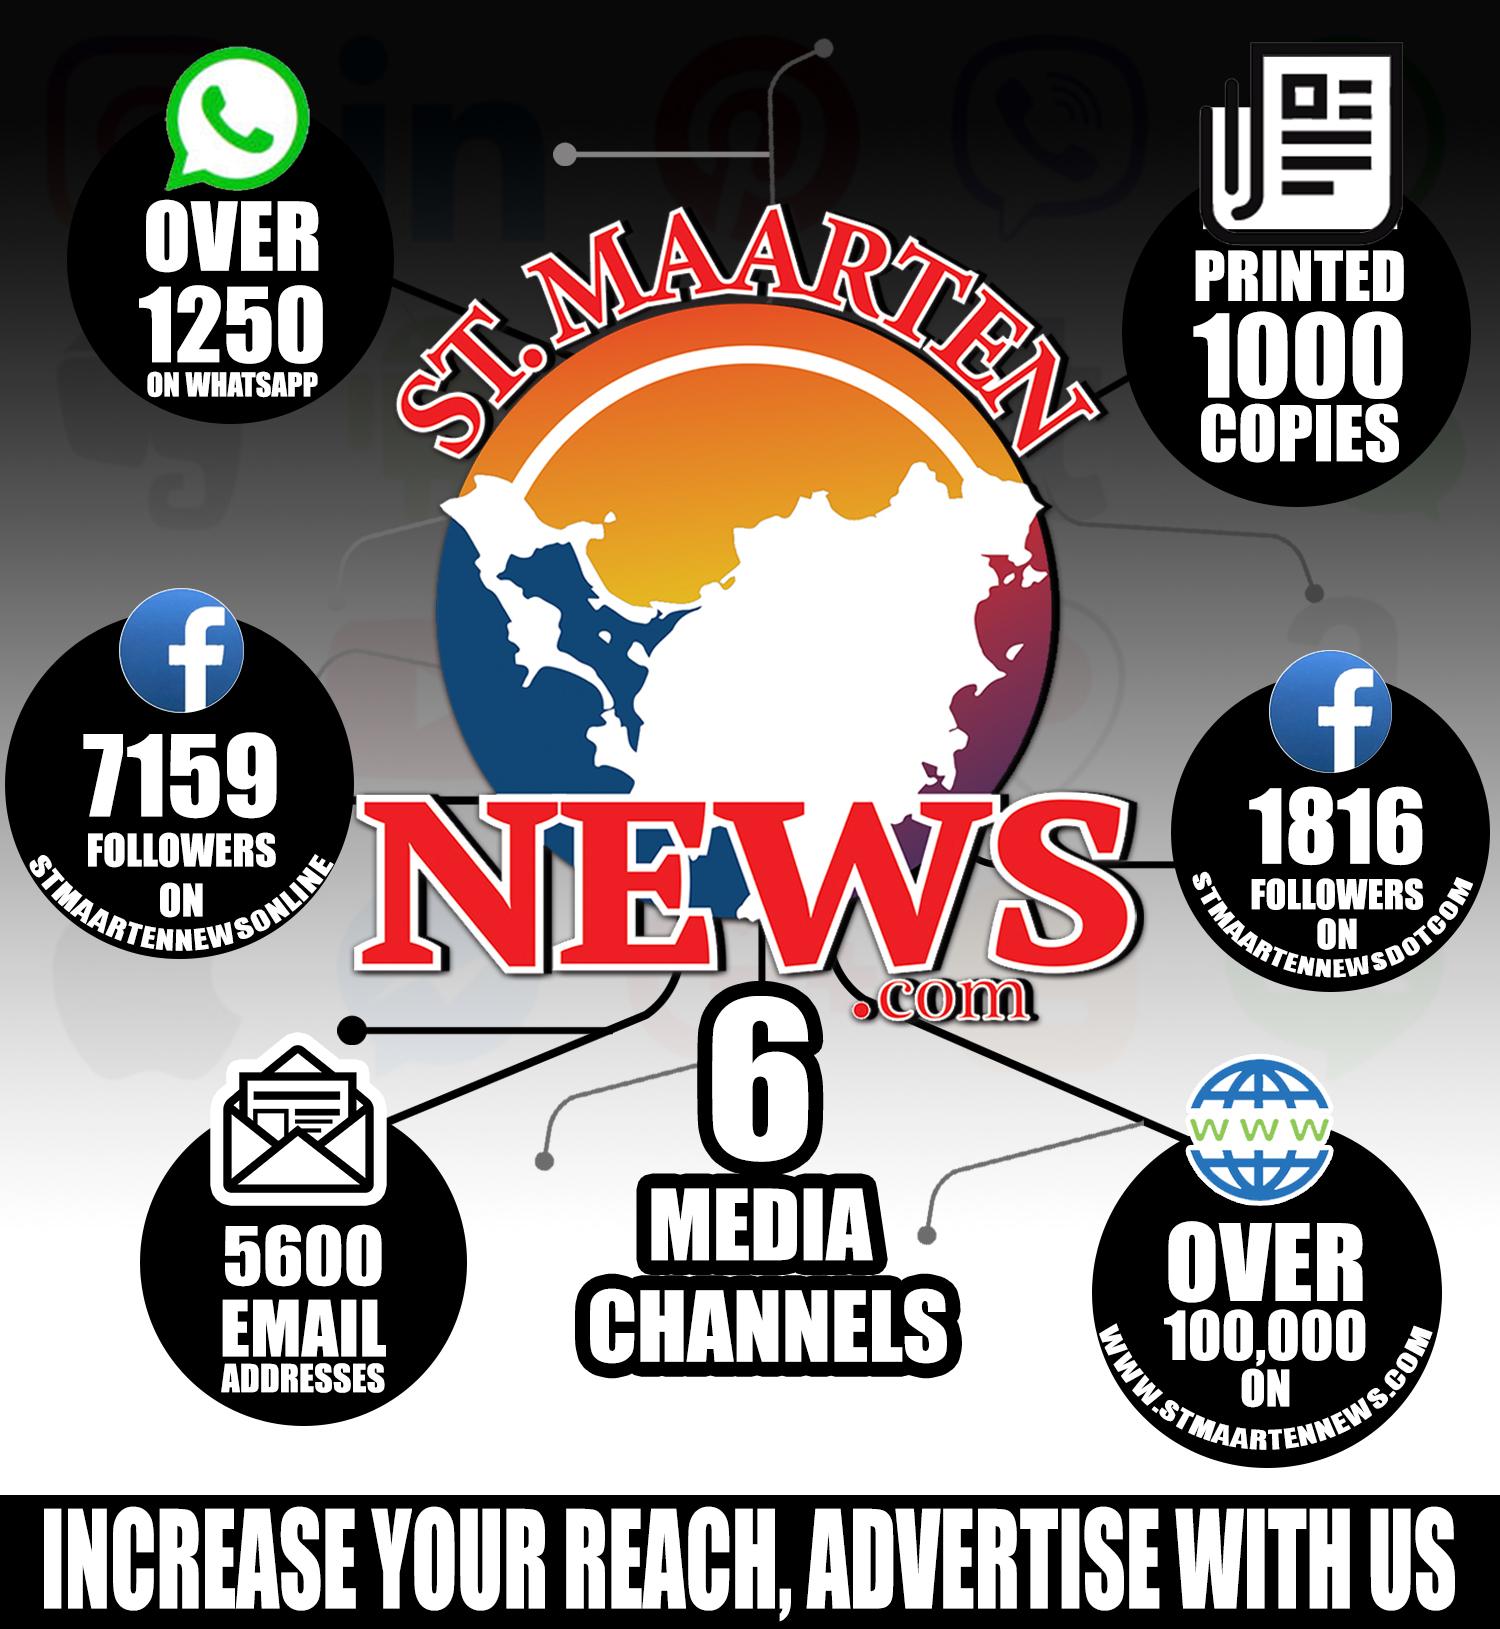 6 media channels StMaartenNews.com